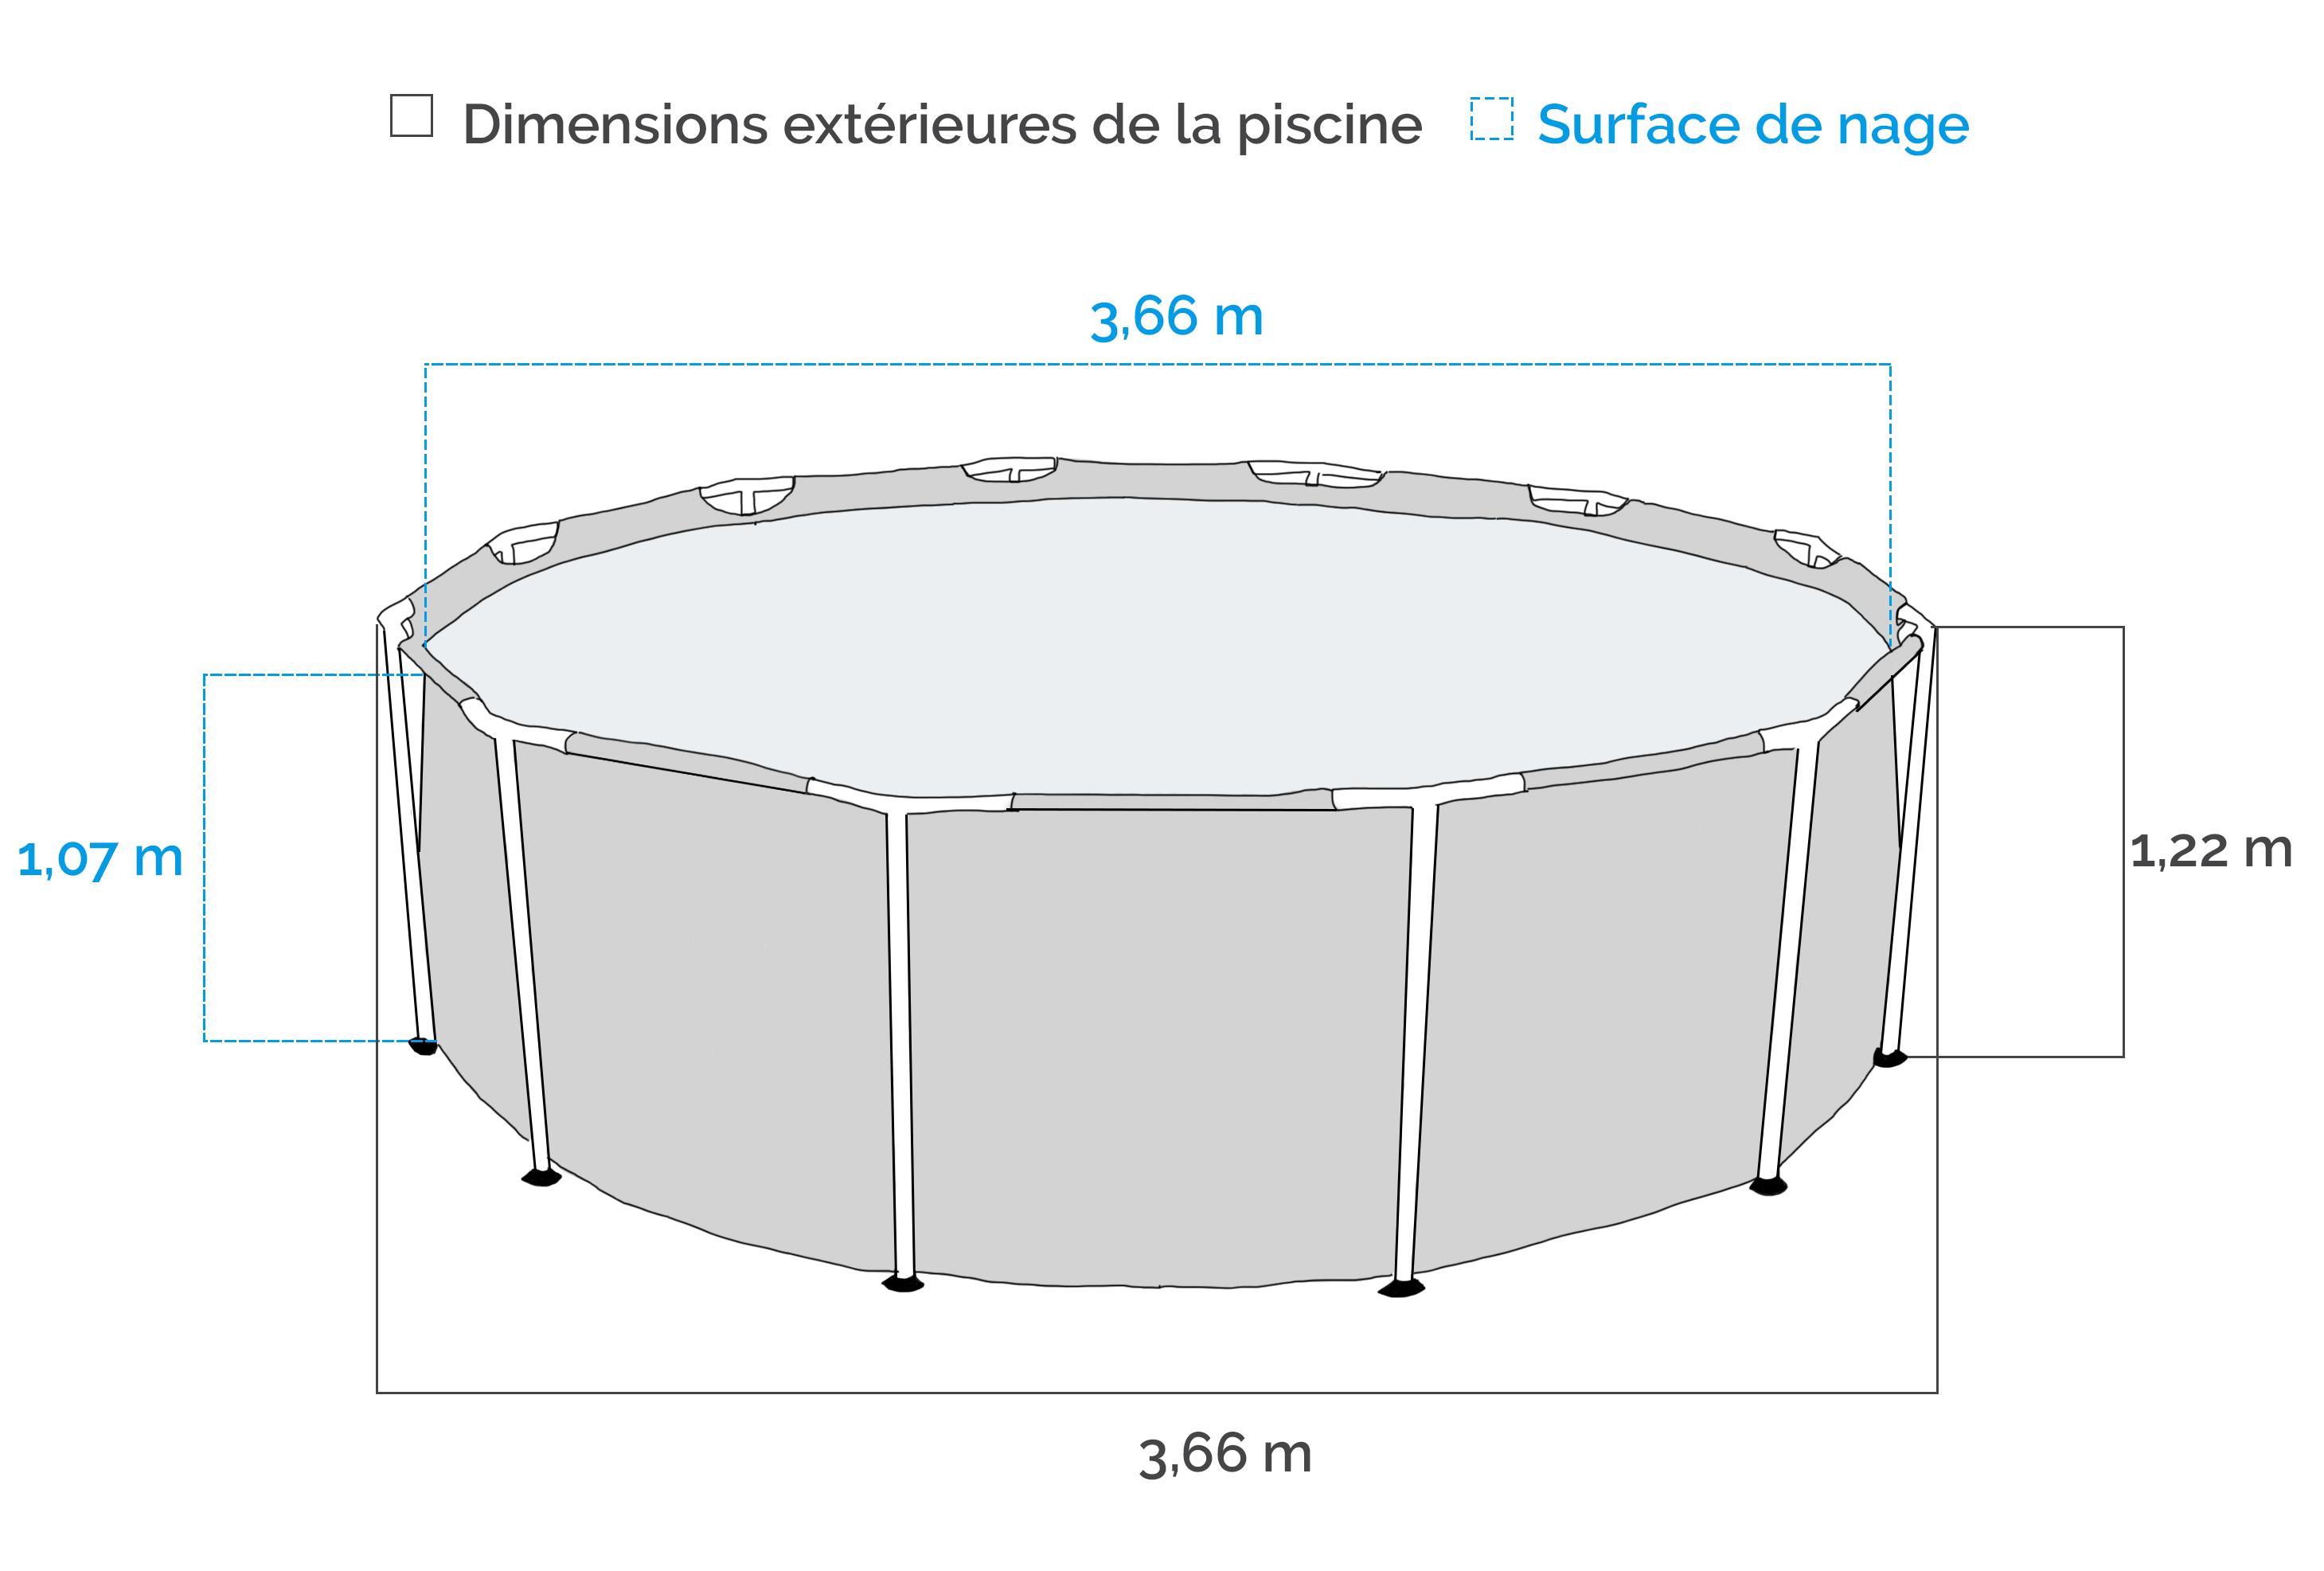 Dimensions piscine tubulaire Intex Prism Frame 3,66 x 1,22 m